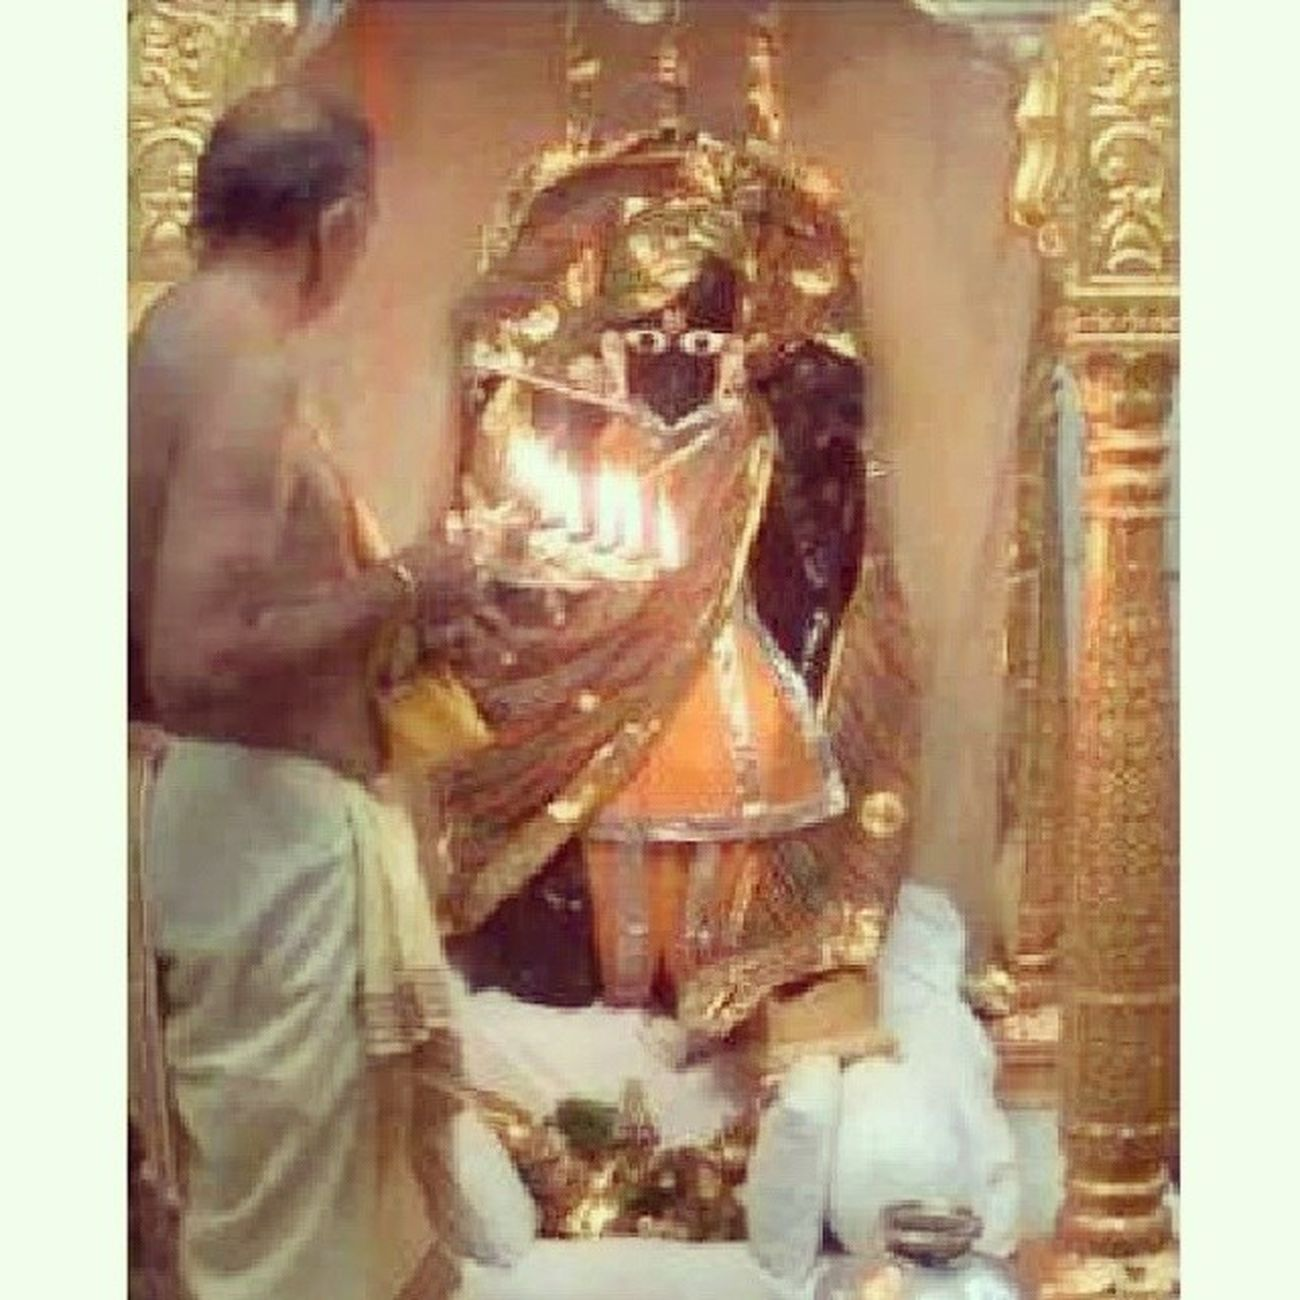 Ranchhodrai Manglaaarti Dakor Mandirtime pray